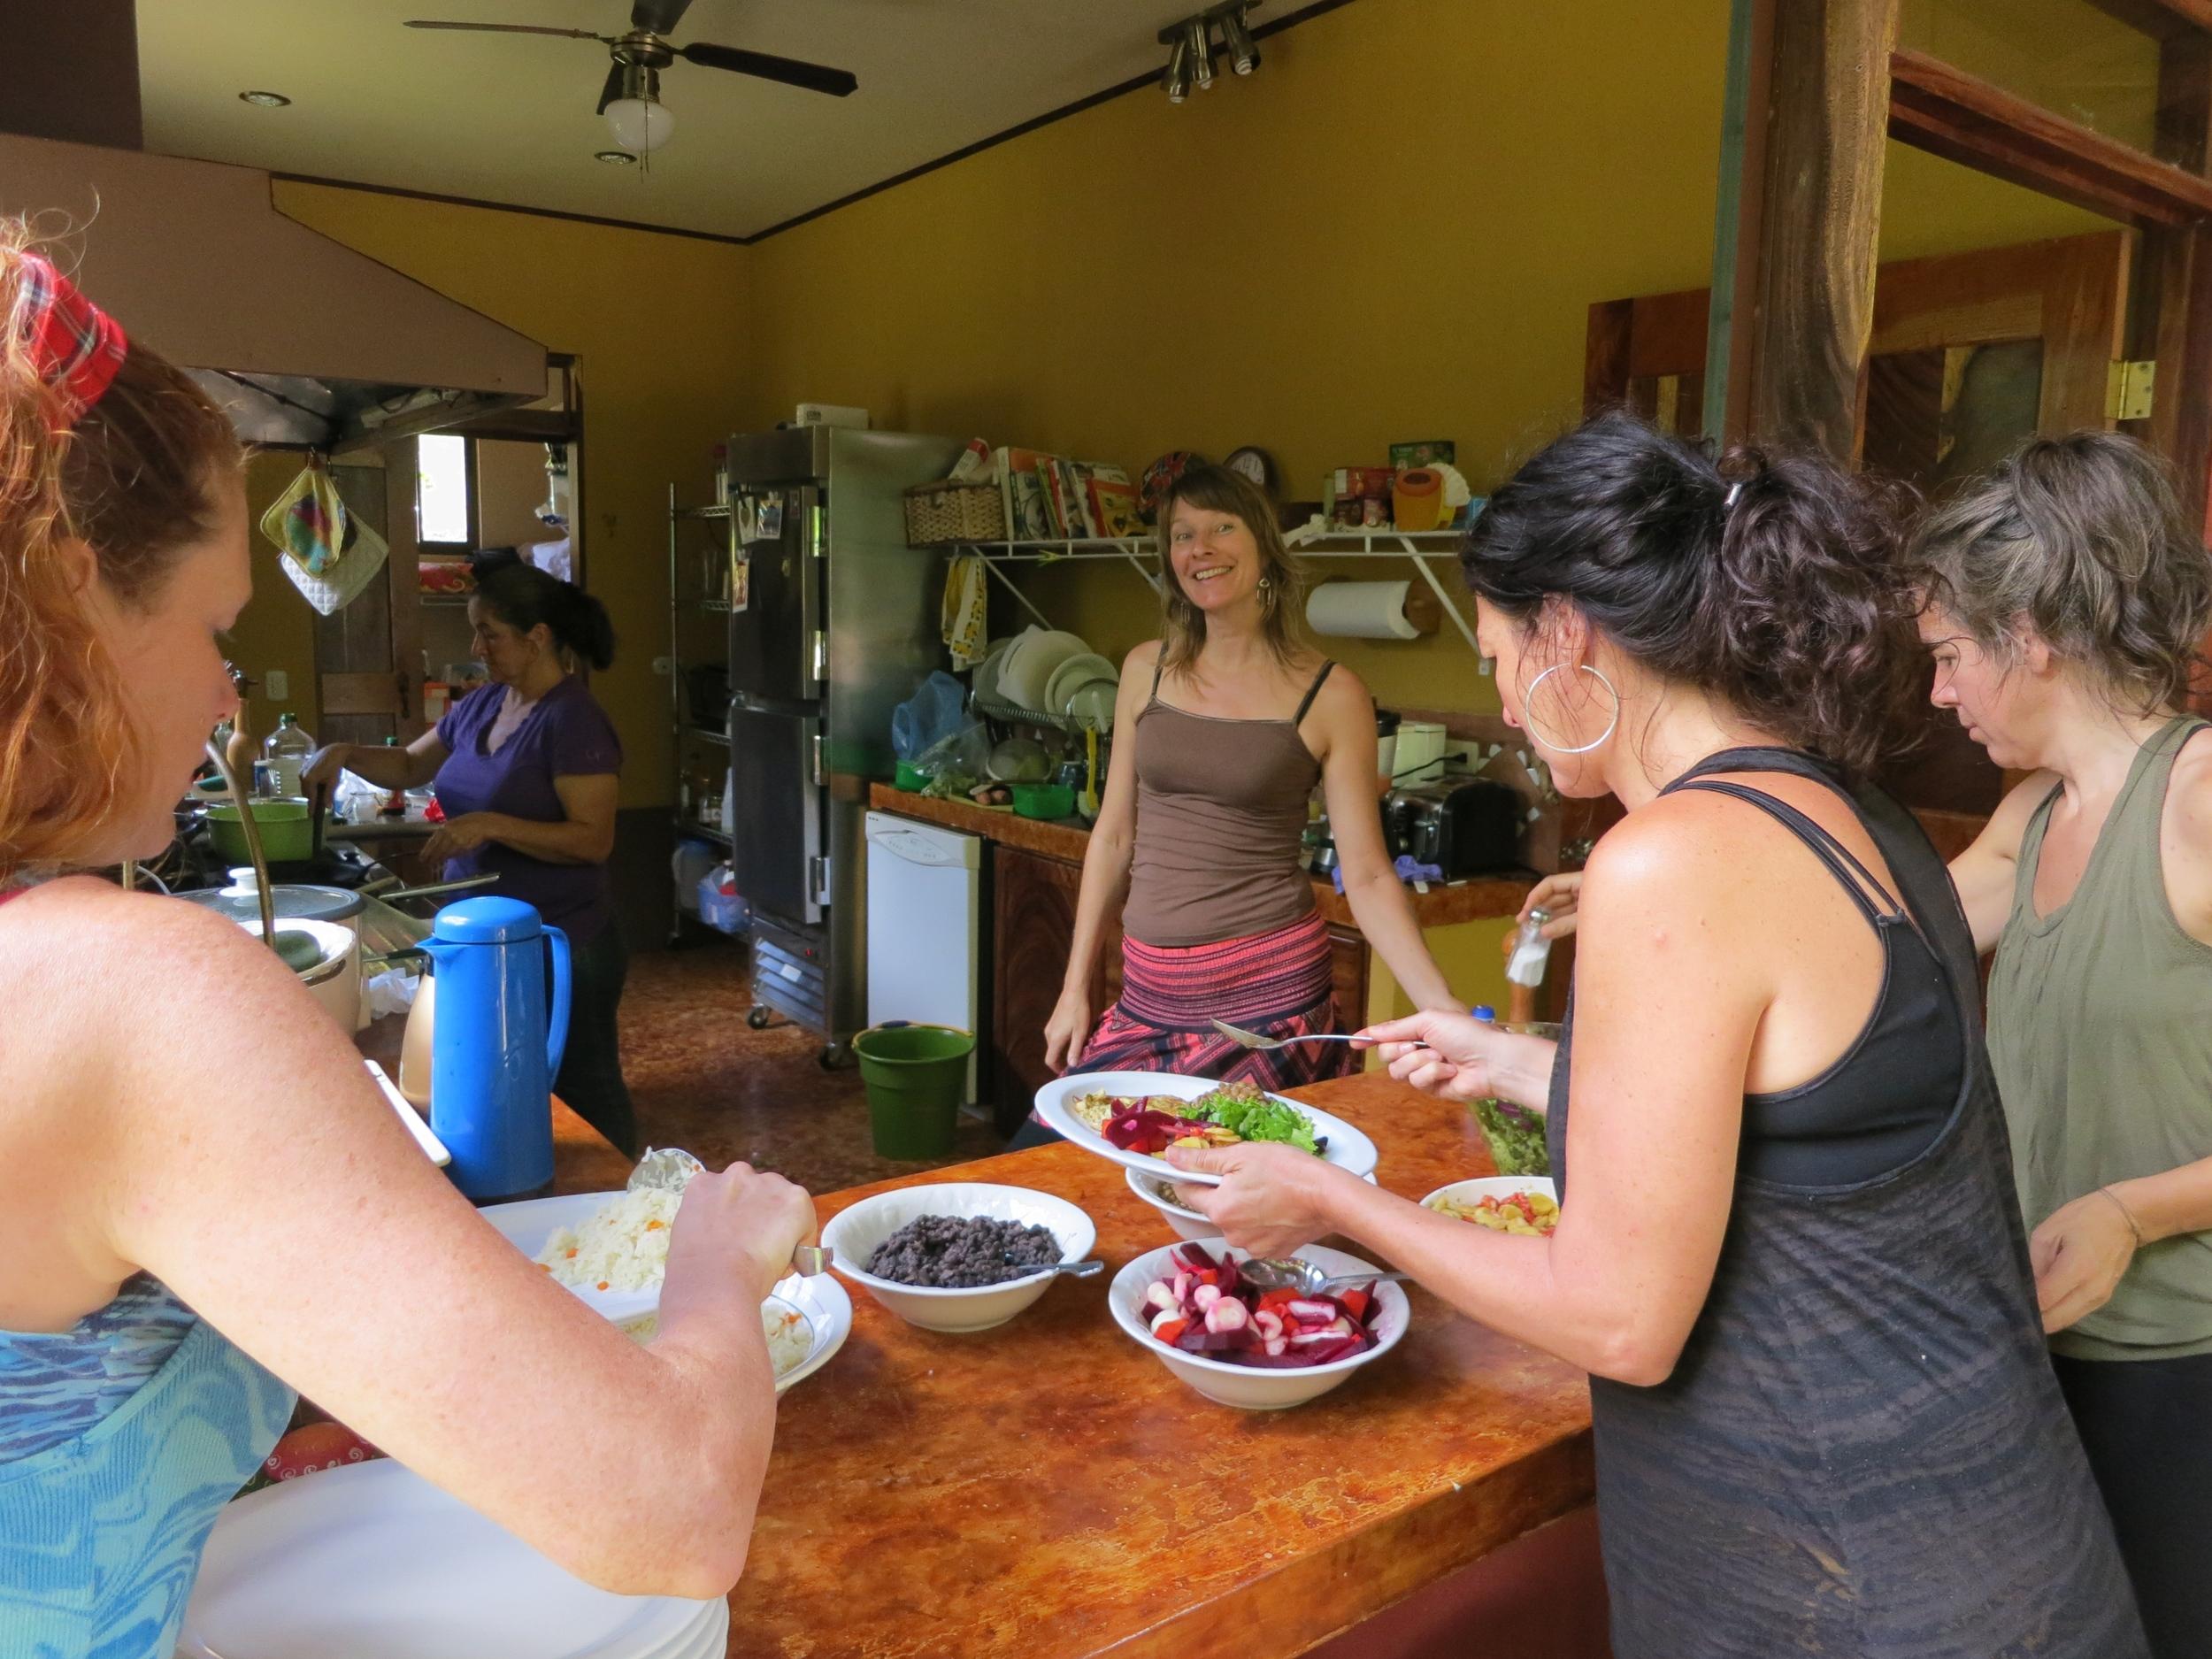 johanna smiling kitchen food.jpg